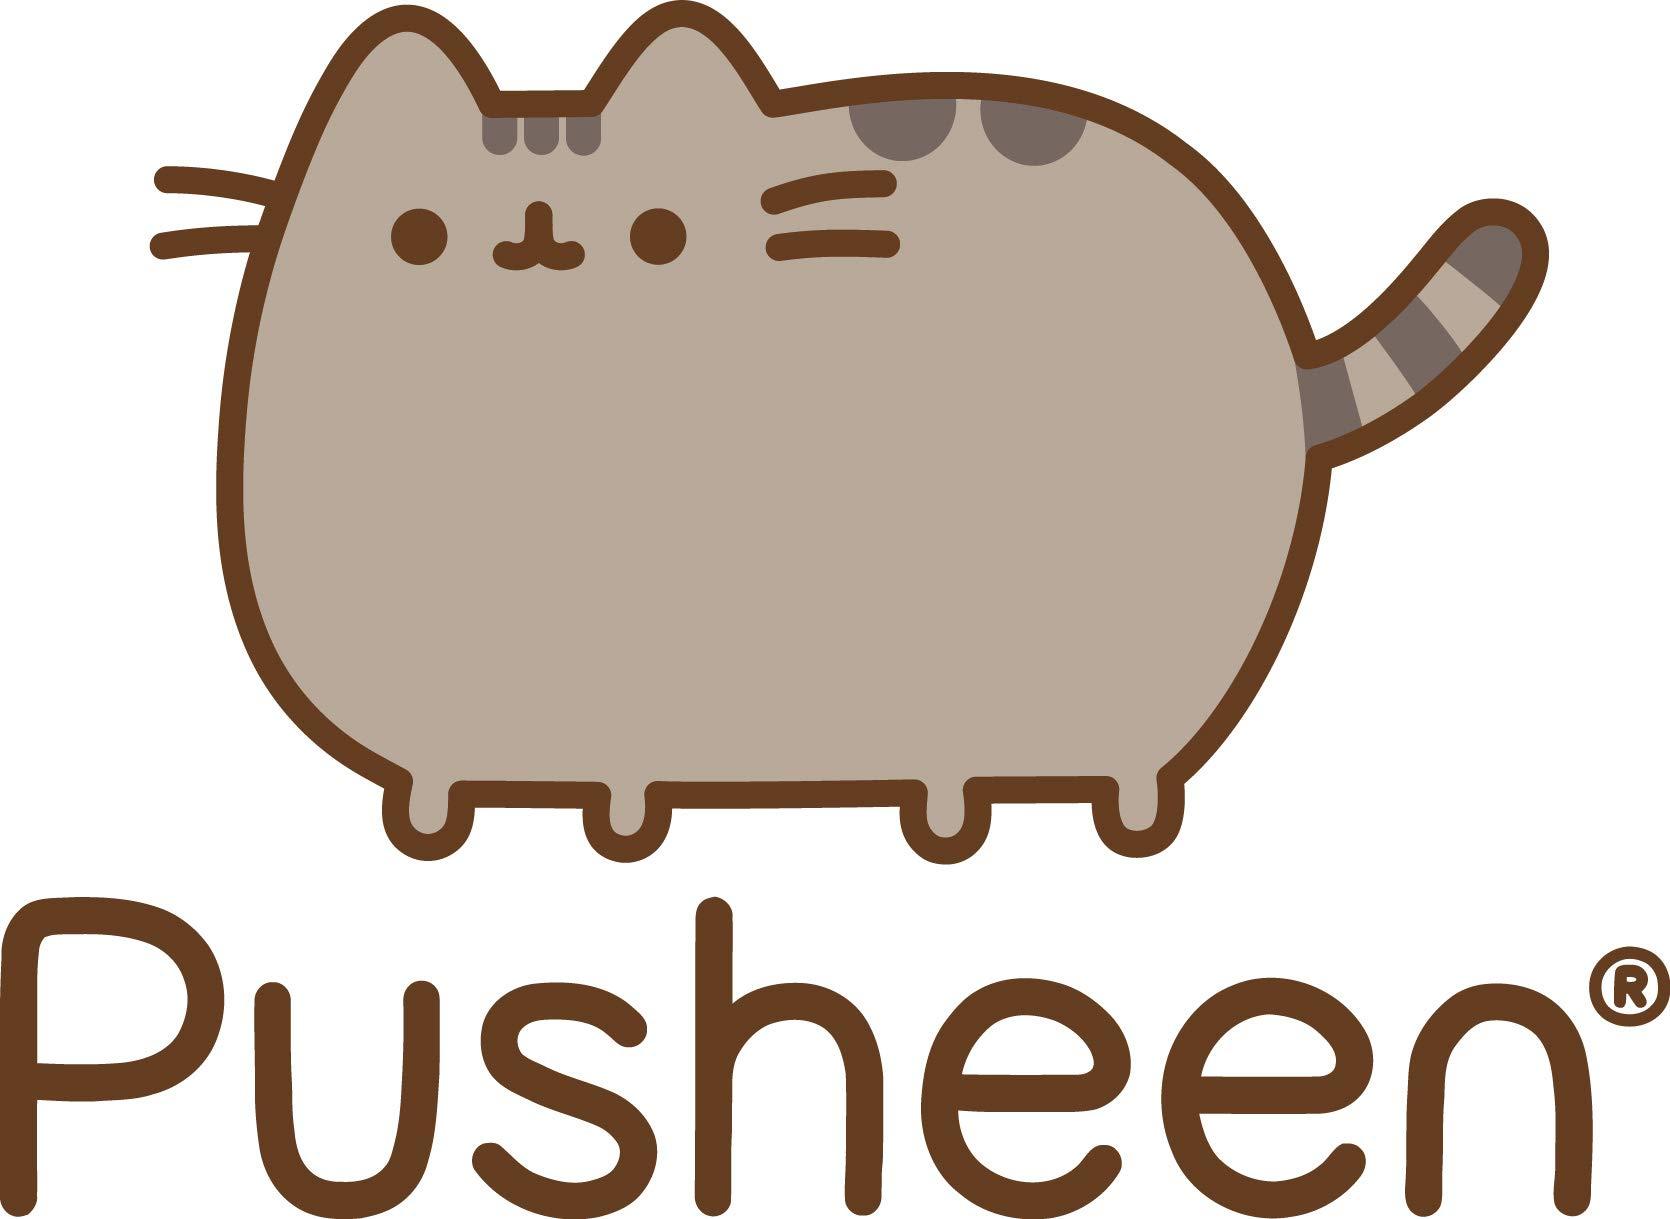 GUND Pusheen Squisheen Sitting Plush Stuffed Cat, 15'' by GUND